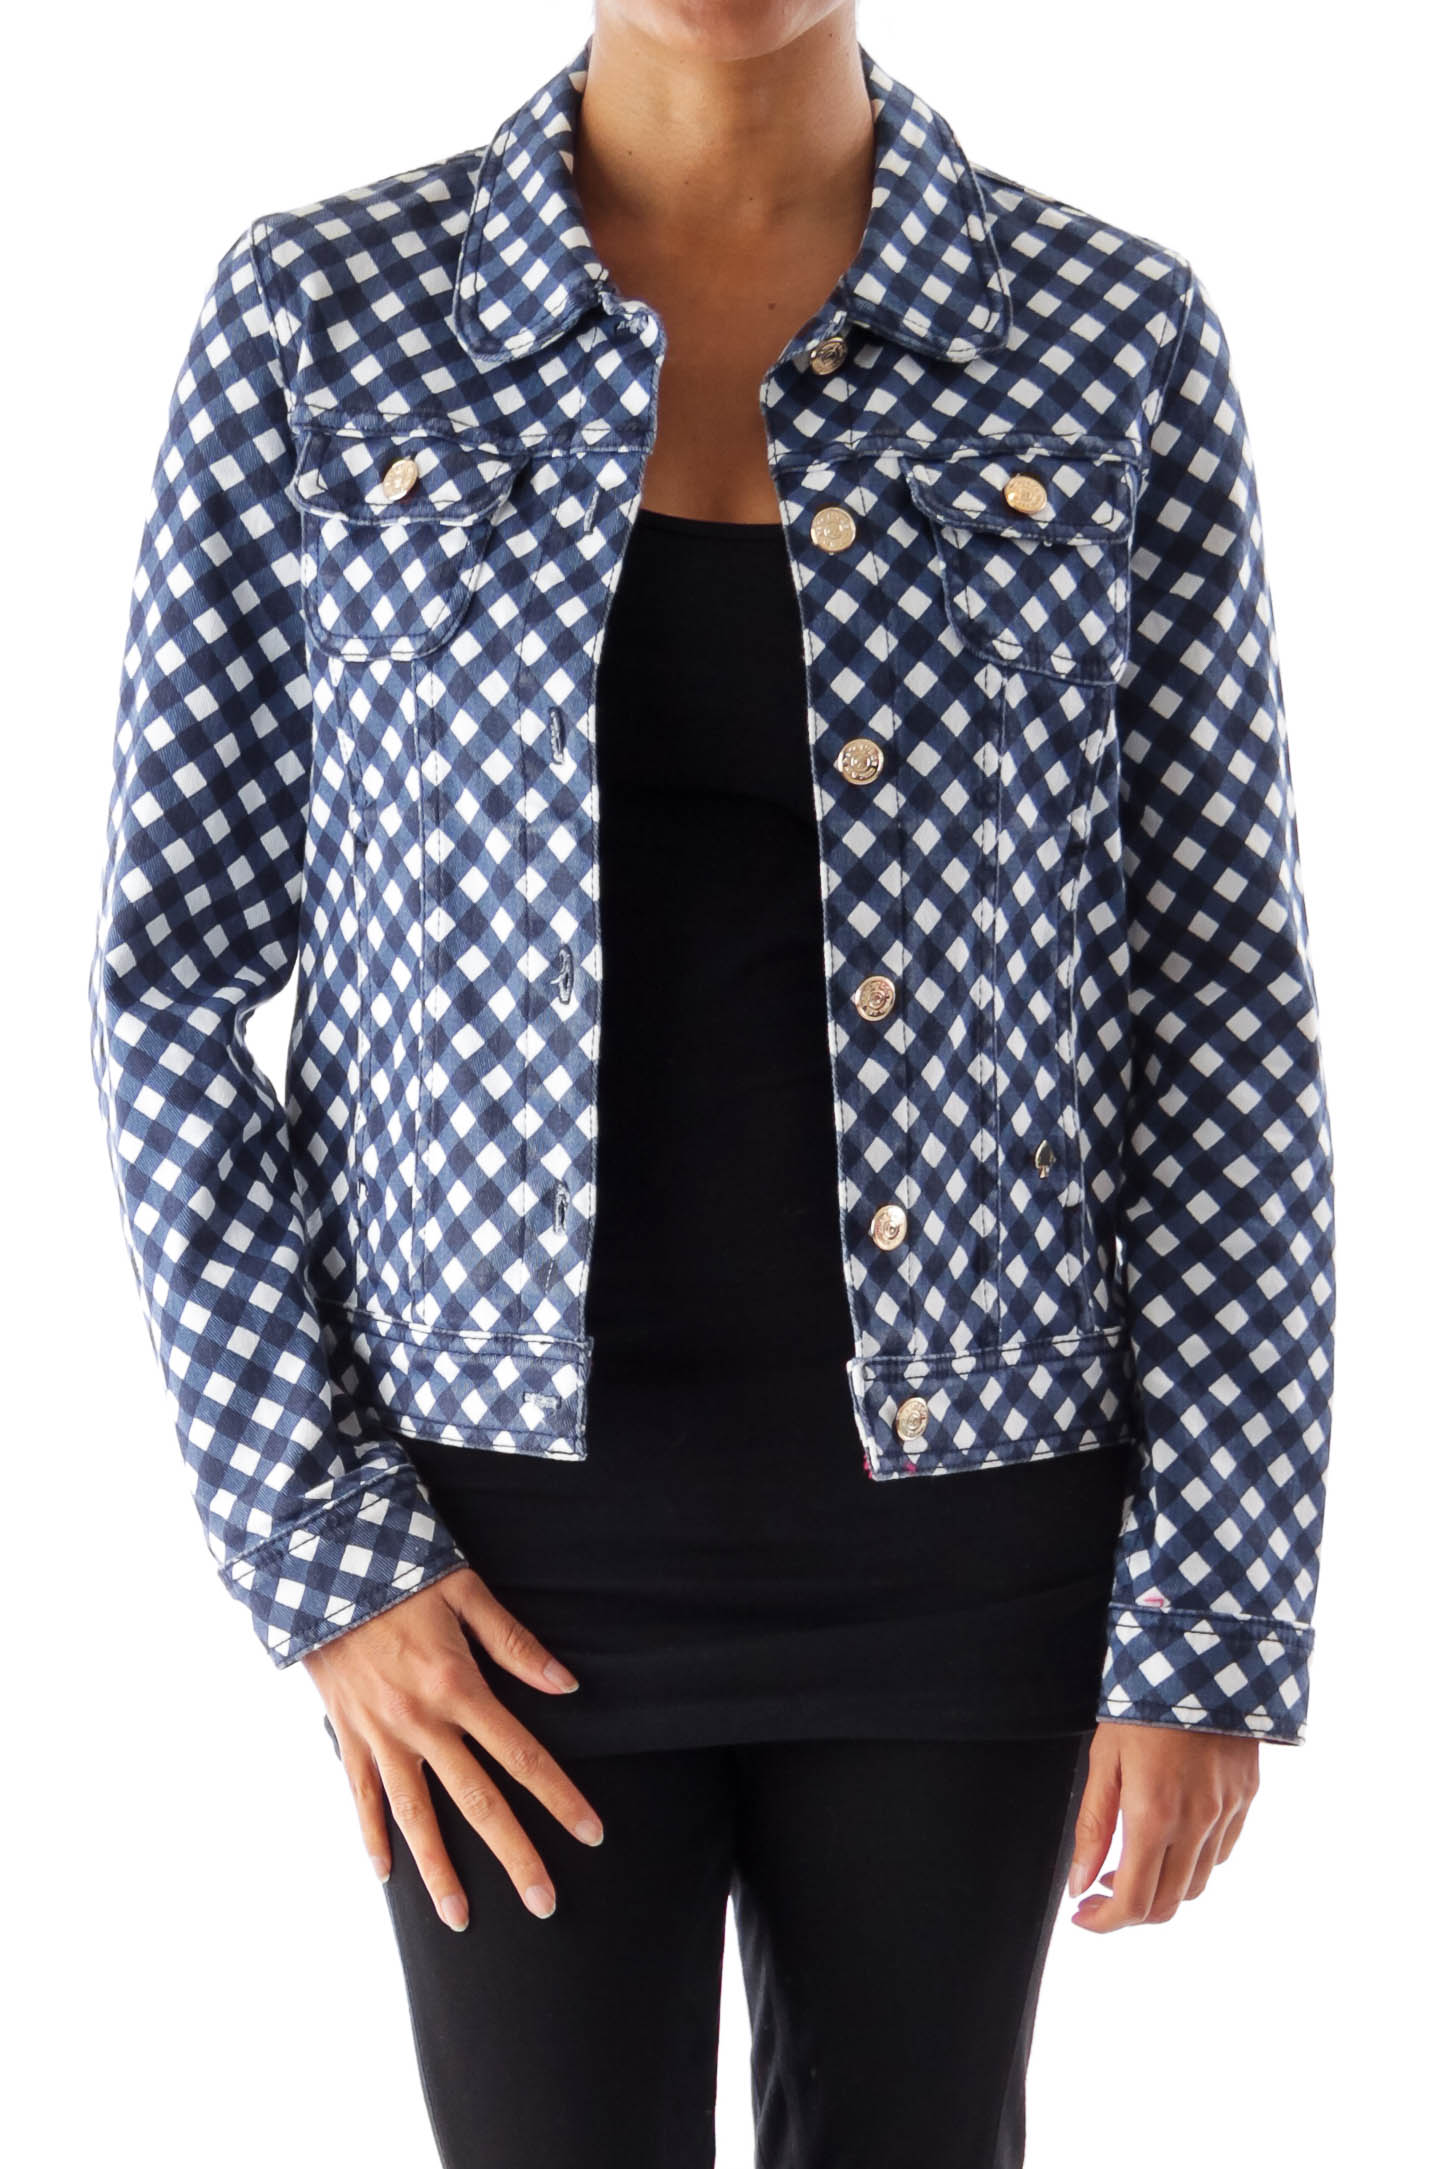 Blue & White Plaid Denim Jacket